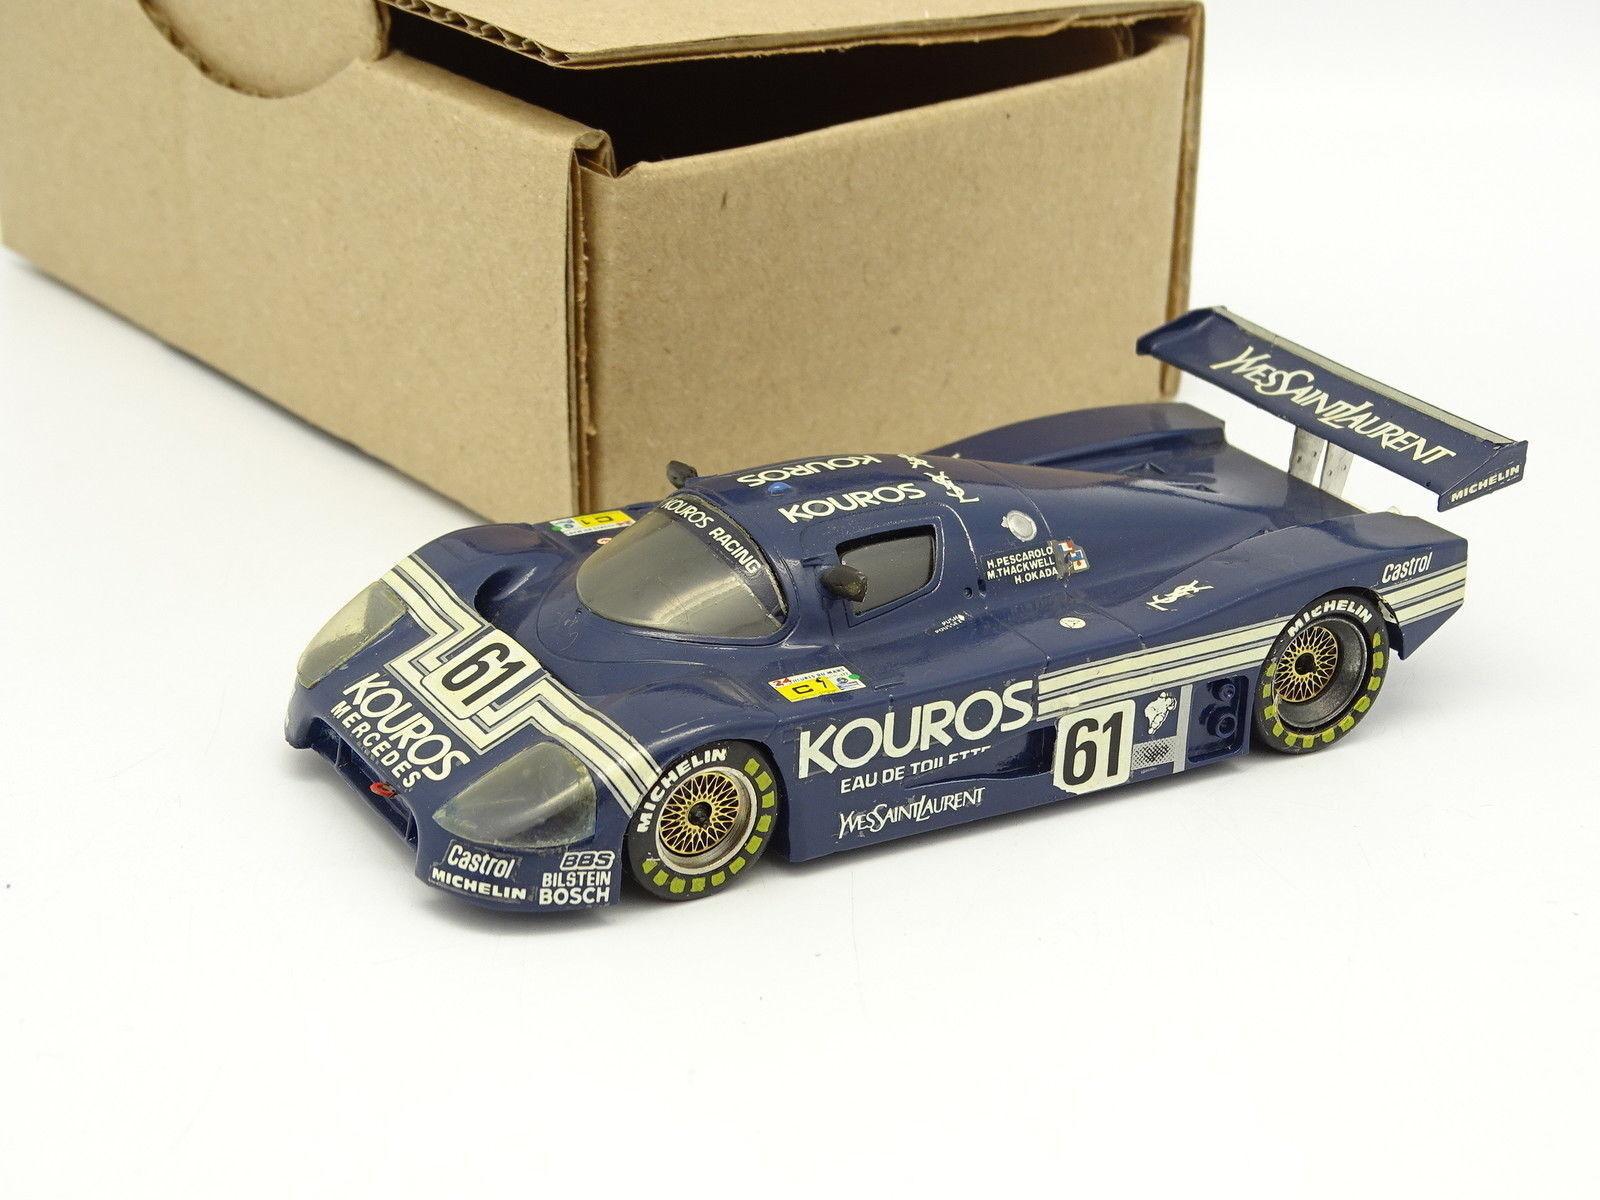 Kit Montado Sb 1 43- Sauber C9 Car Kouros Mercedes Le Mans 1987